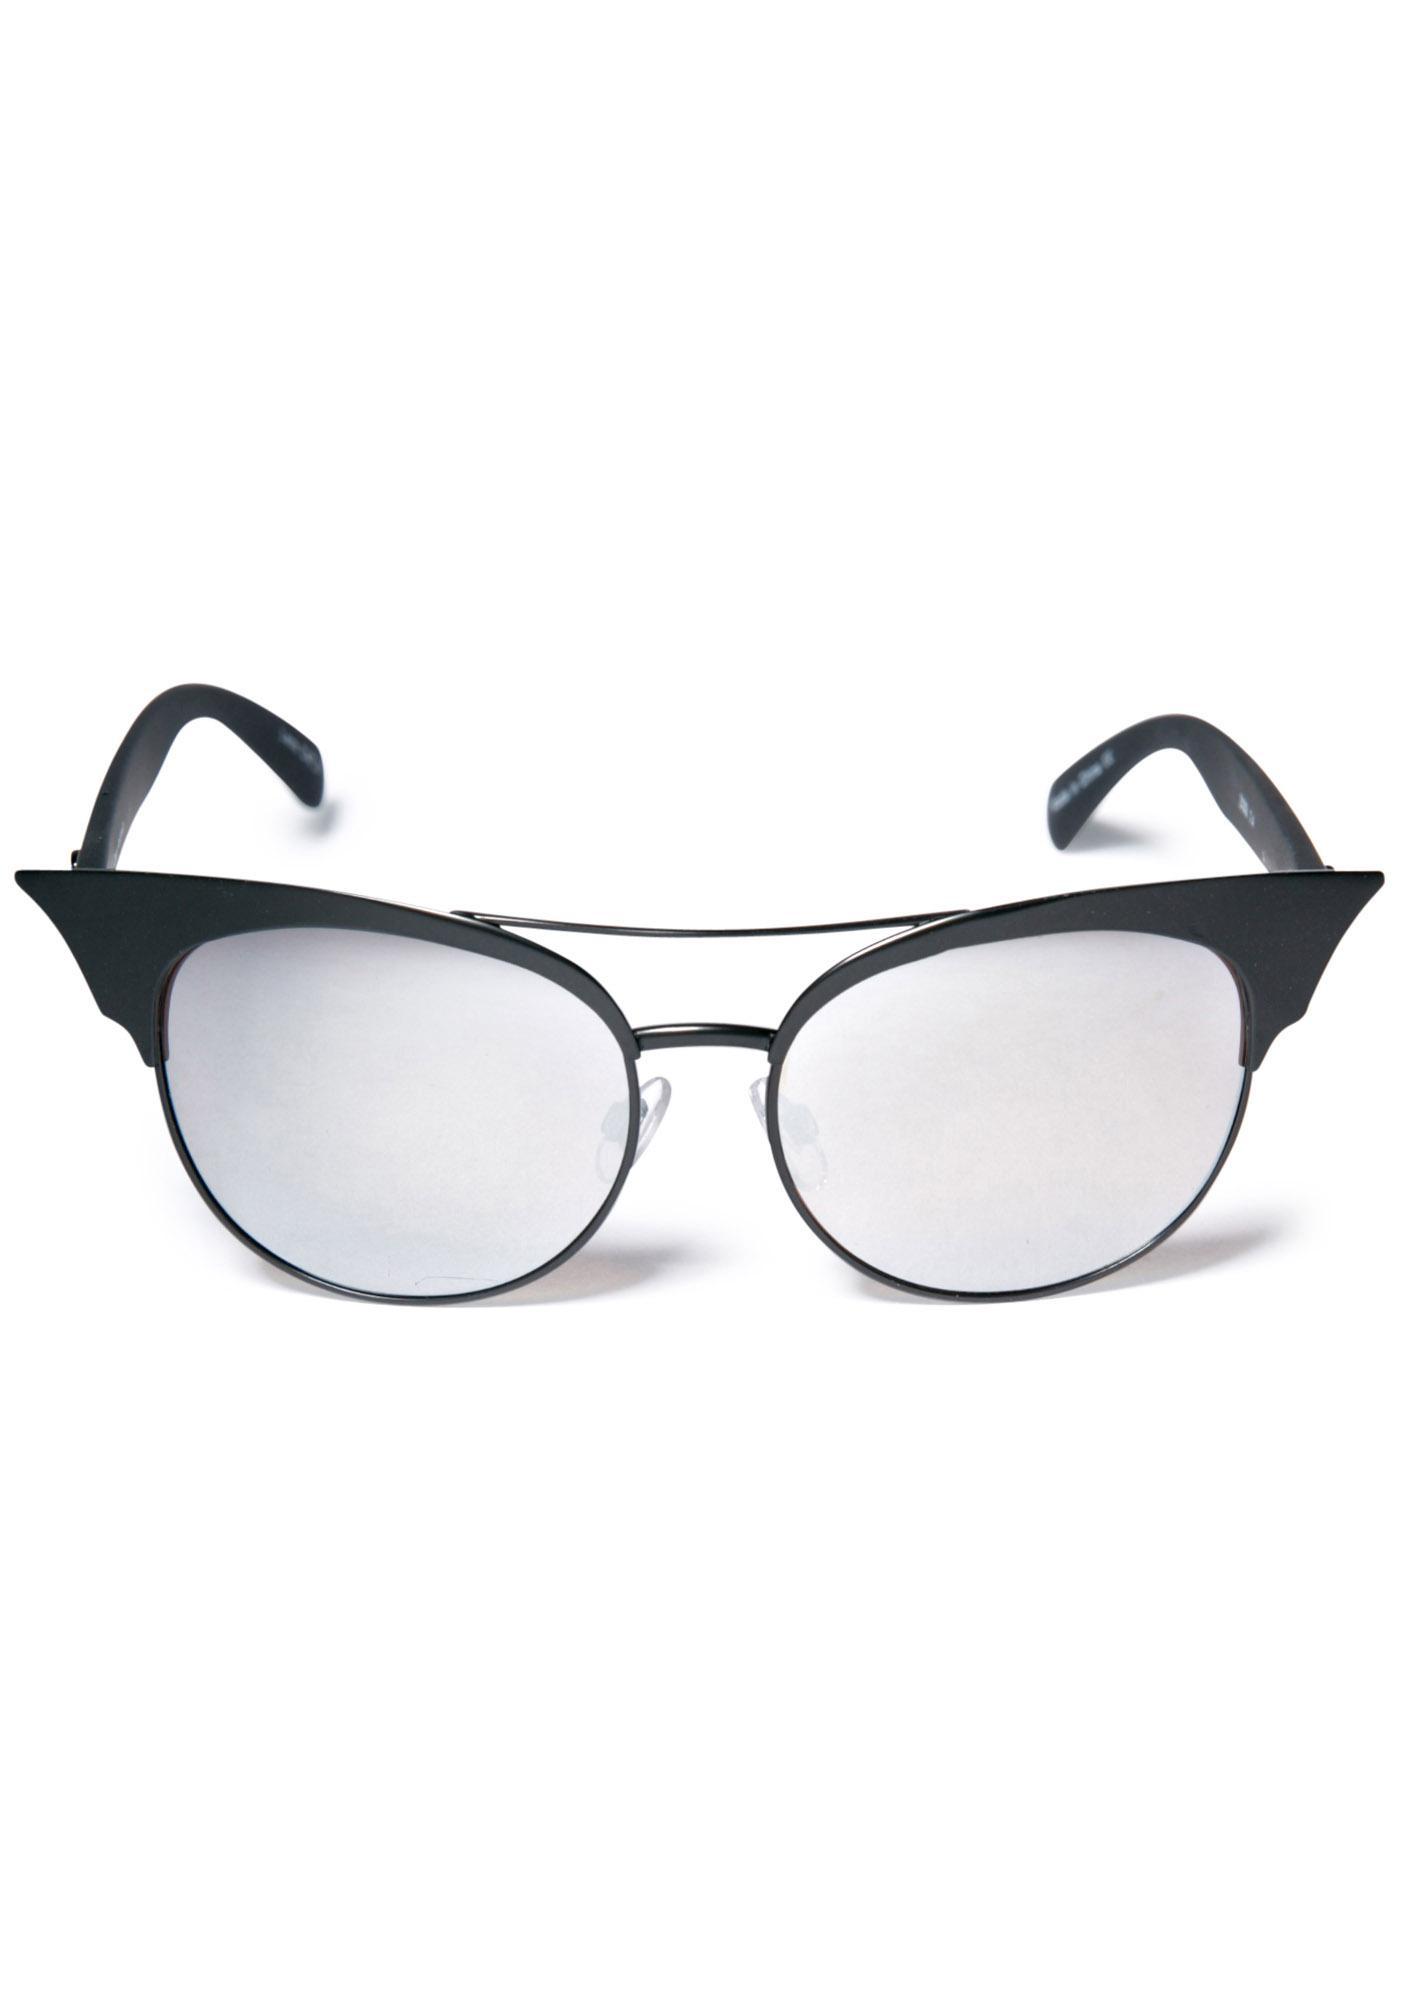 07d59eb6fc ... Quay Eyeware Zig Sunglasses ...